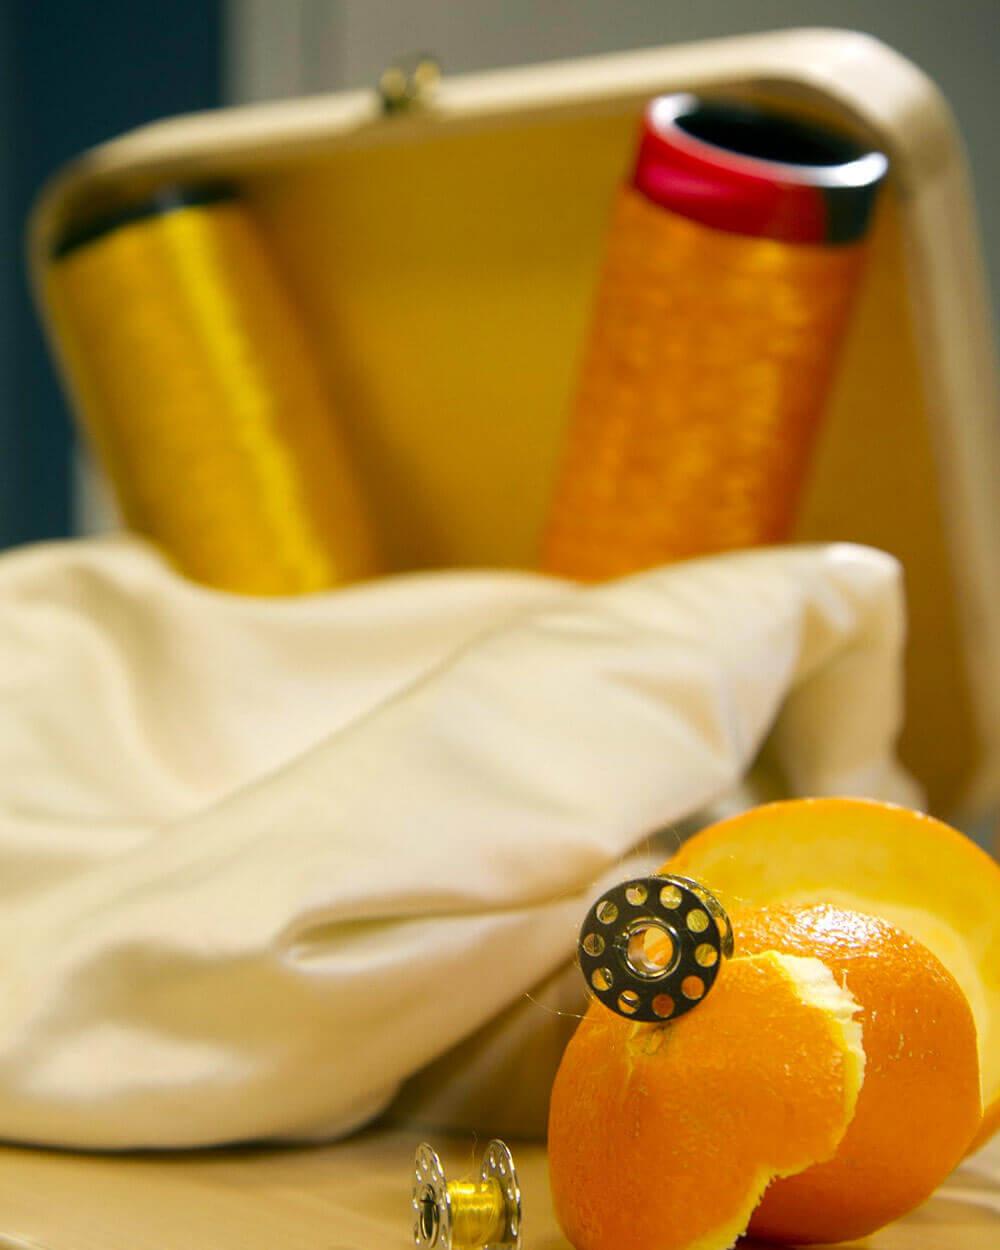 Fabrics from oranges